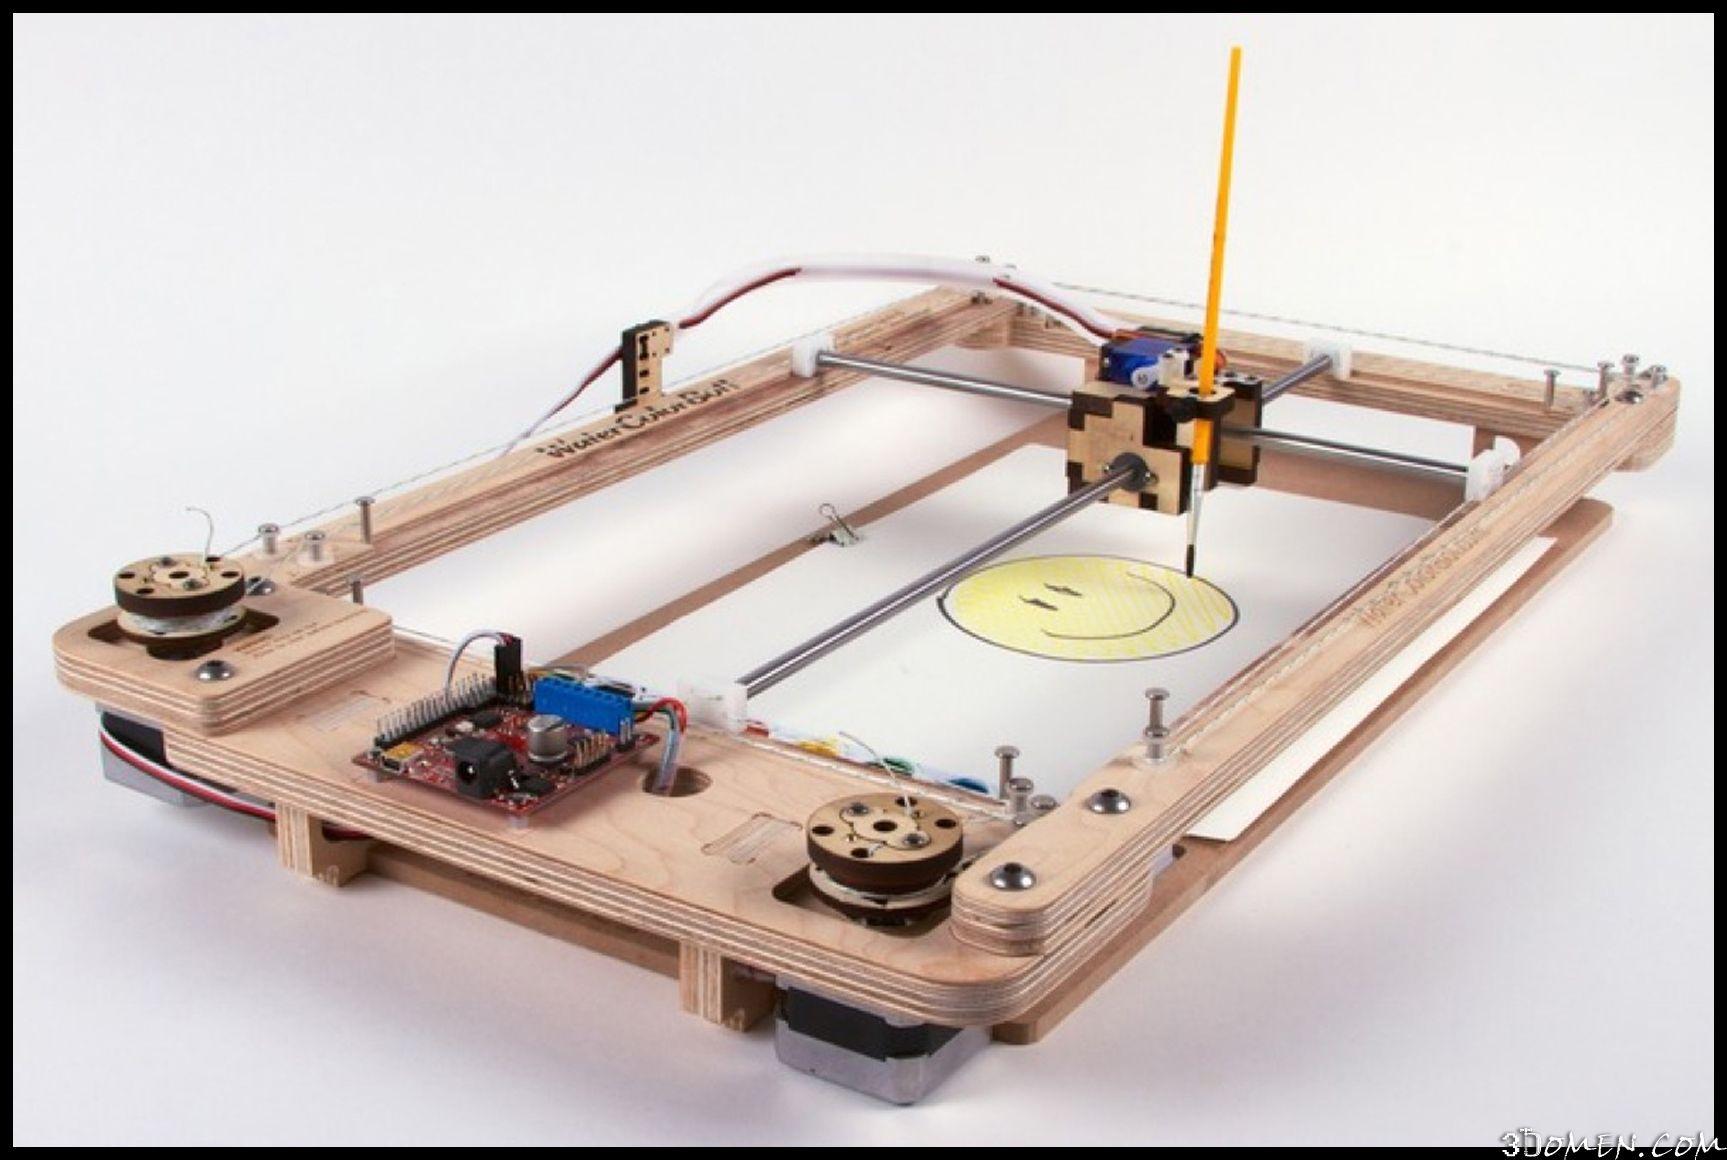 Watercolorbot Robot Risuet Kopii Cifrovyh Izobrazhenij